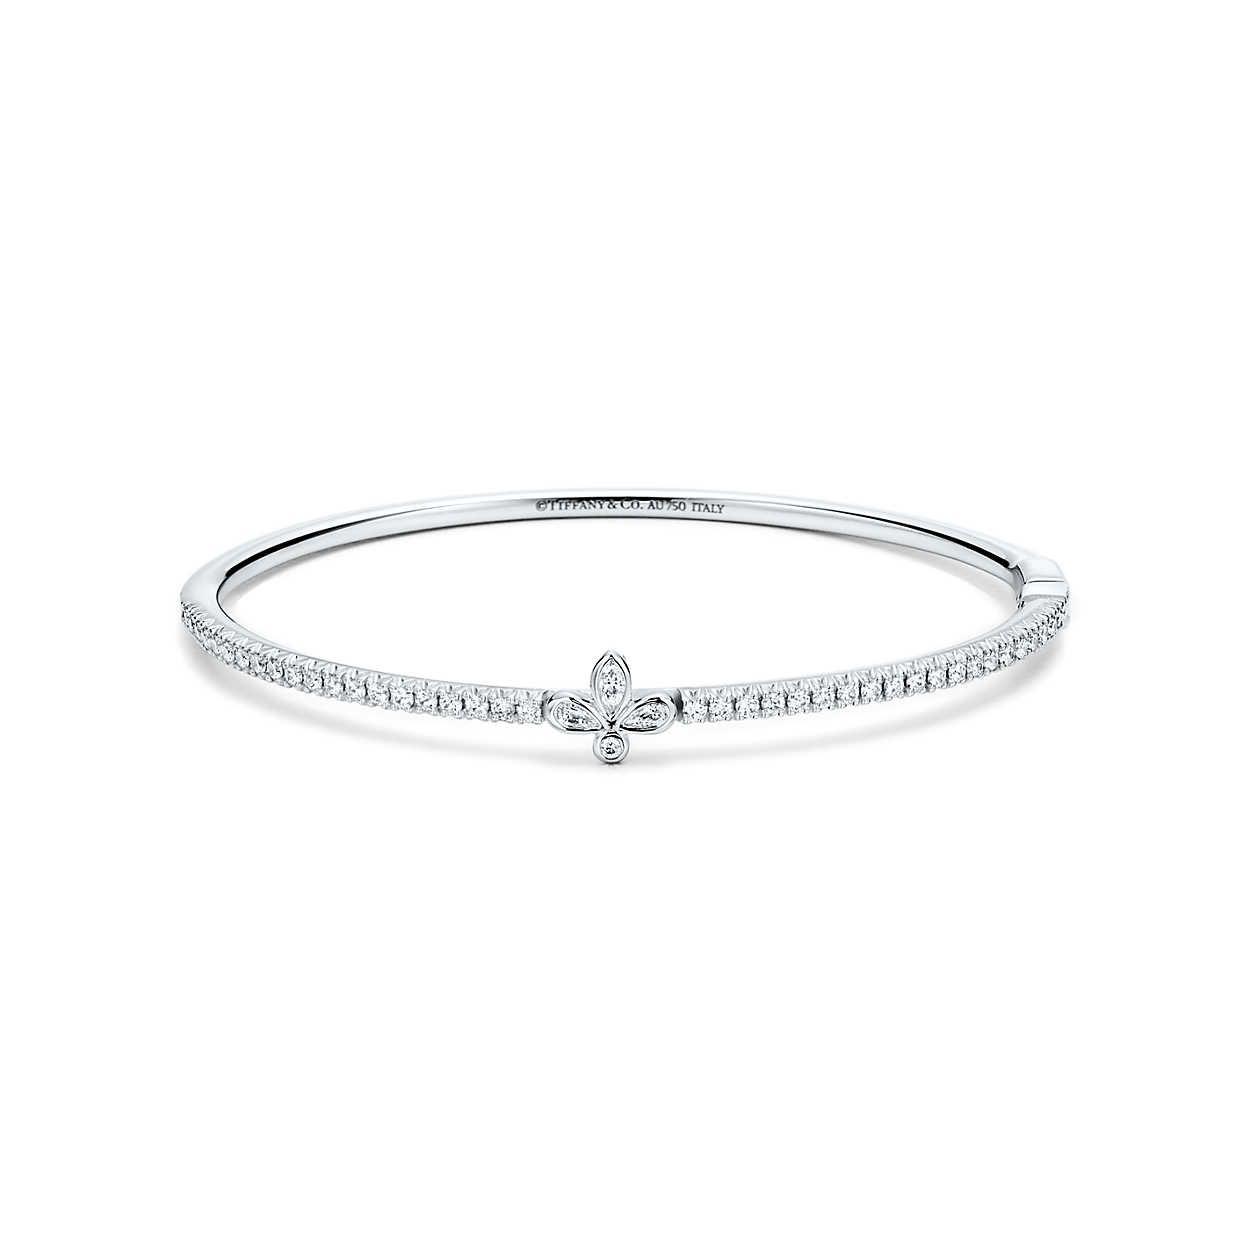 cb266c03fe7e0 Bangle in 2019 | Jewelry | Tiffany, Diamond bangle, Jewelry